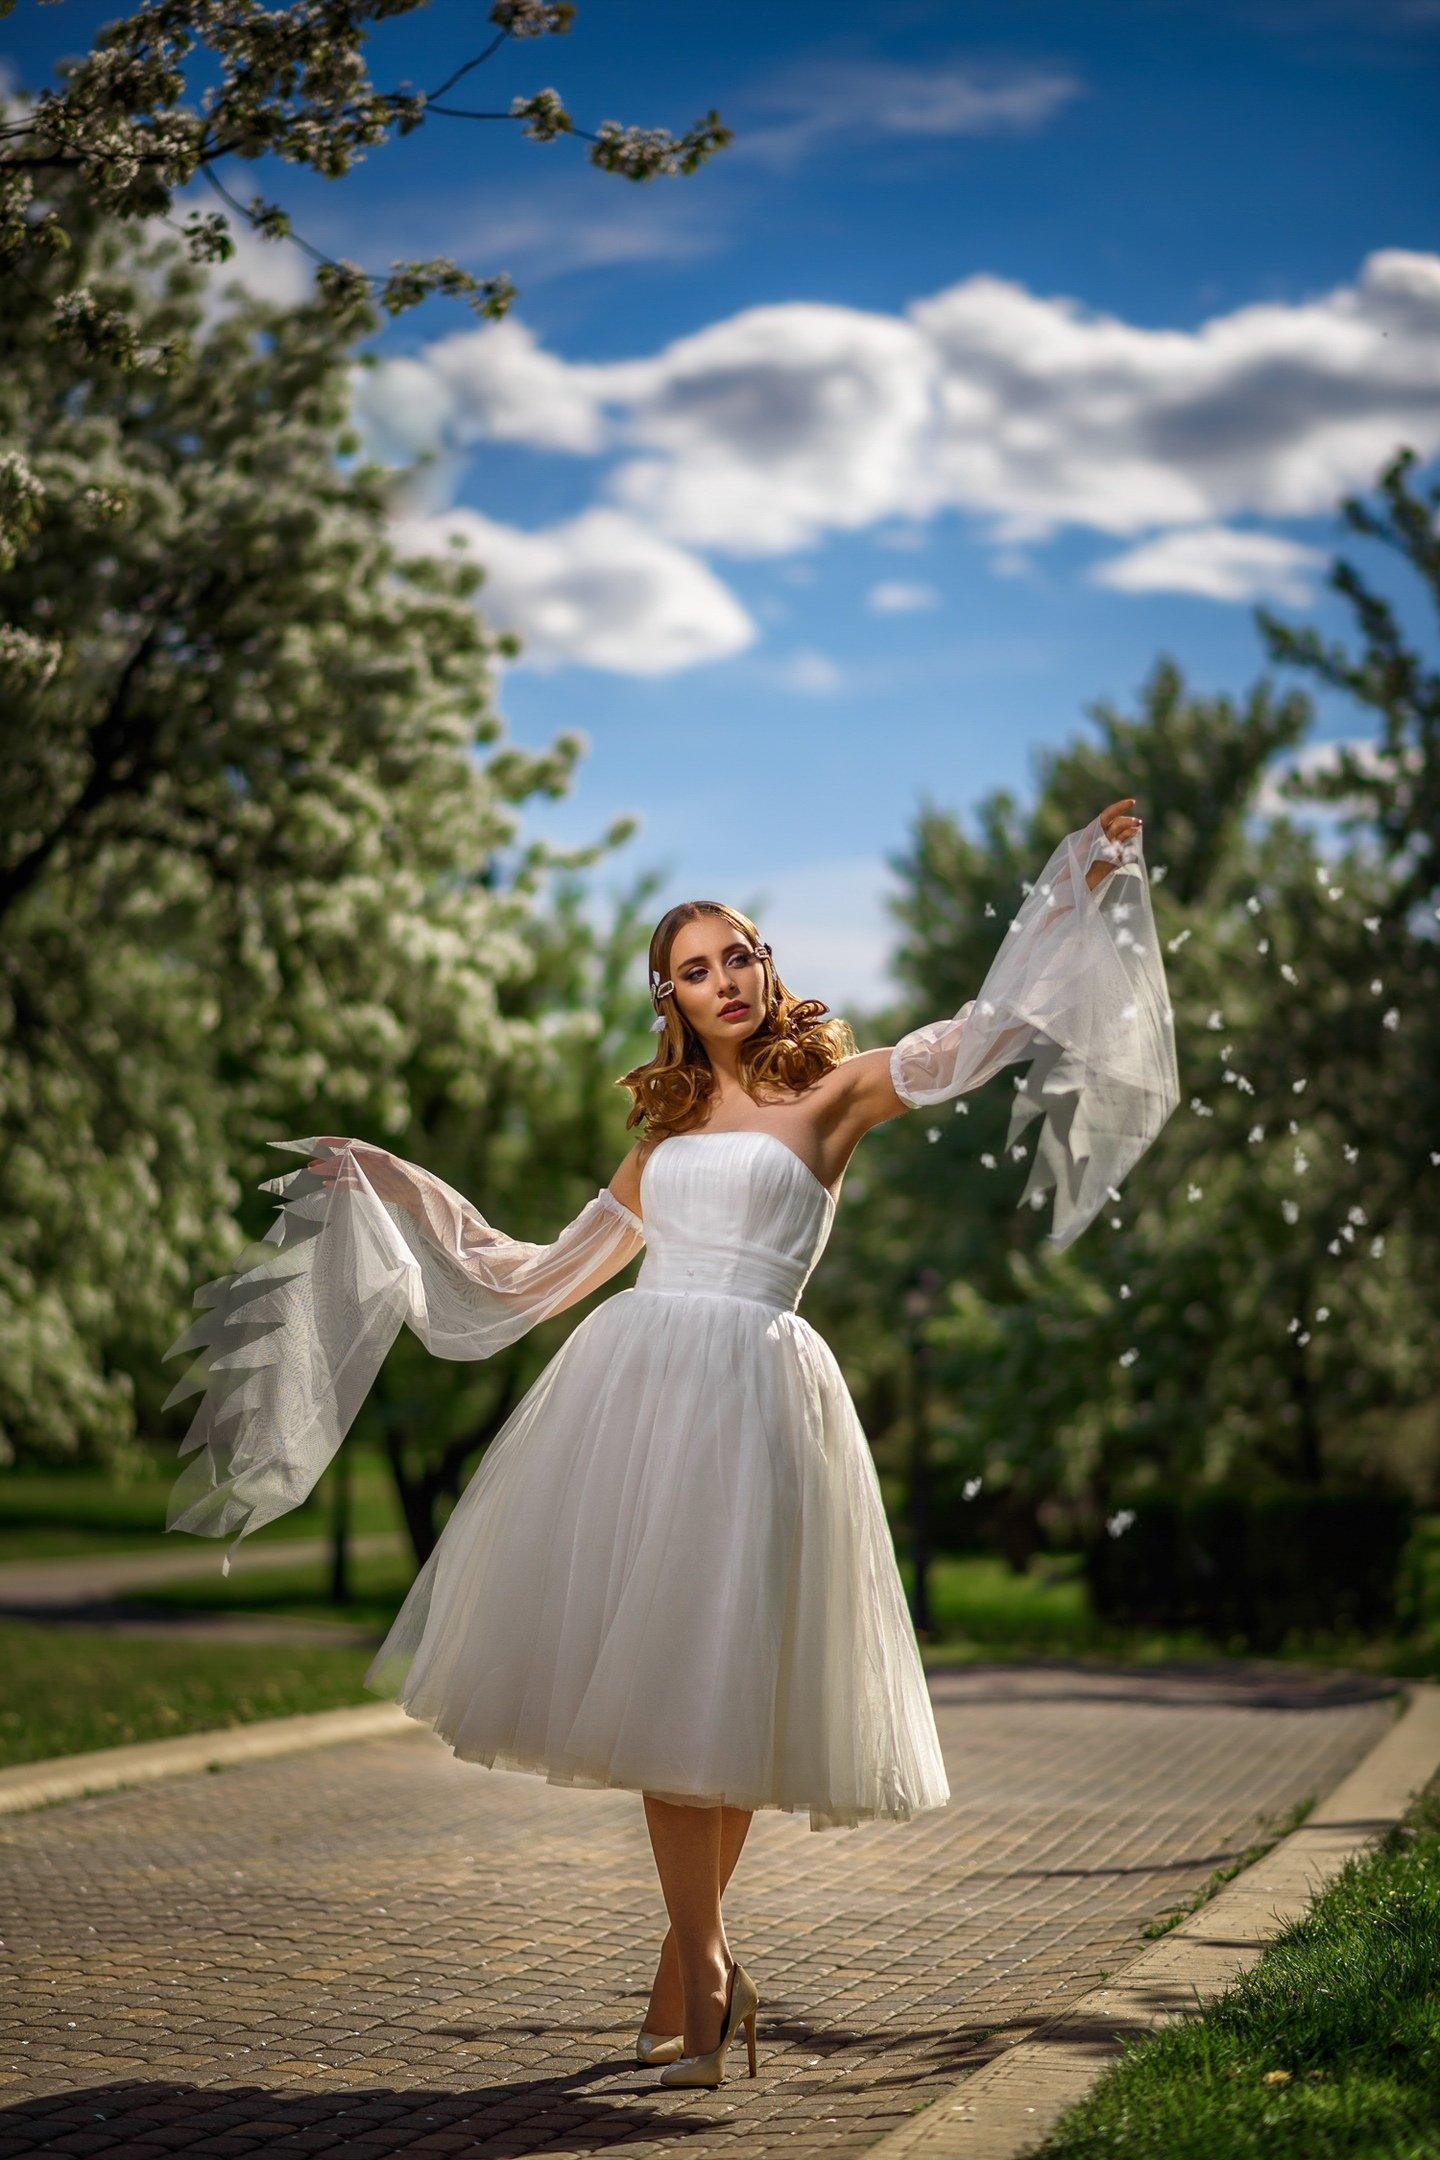 portrait girl  white model dmitrymedved, Медведь Дмитрий